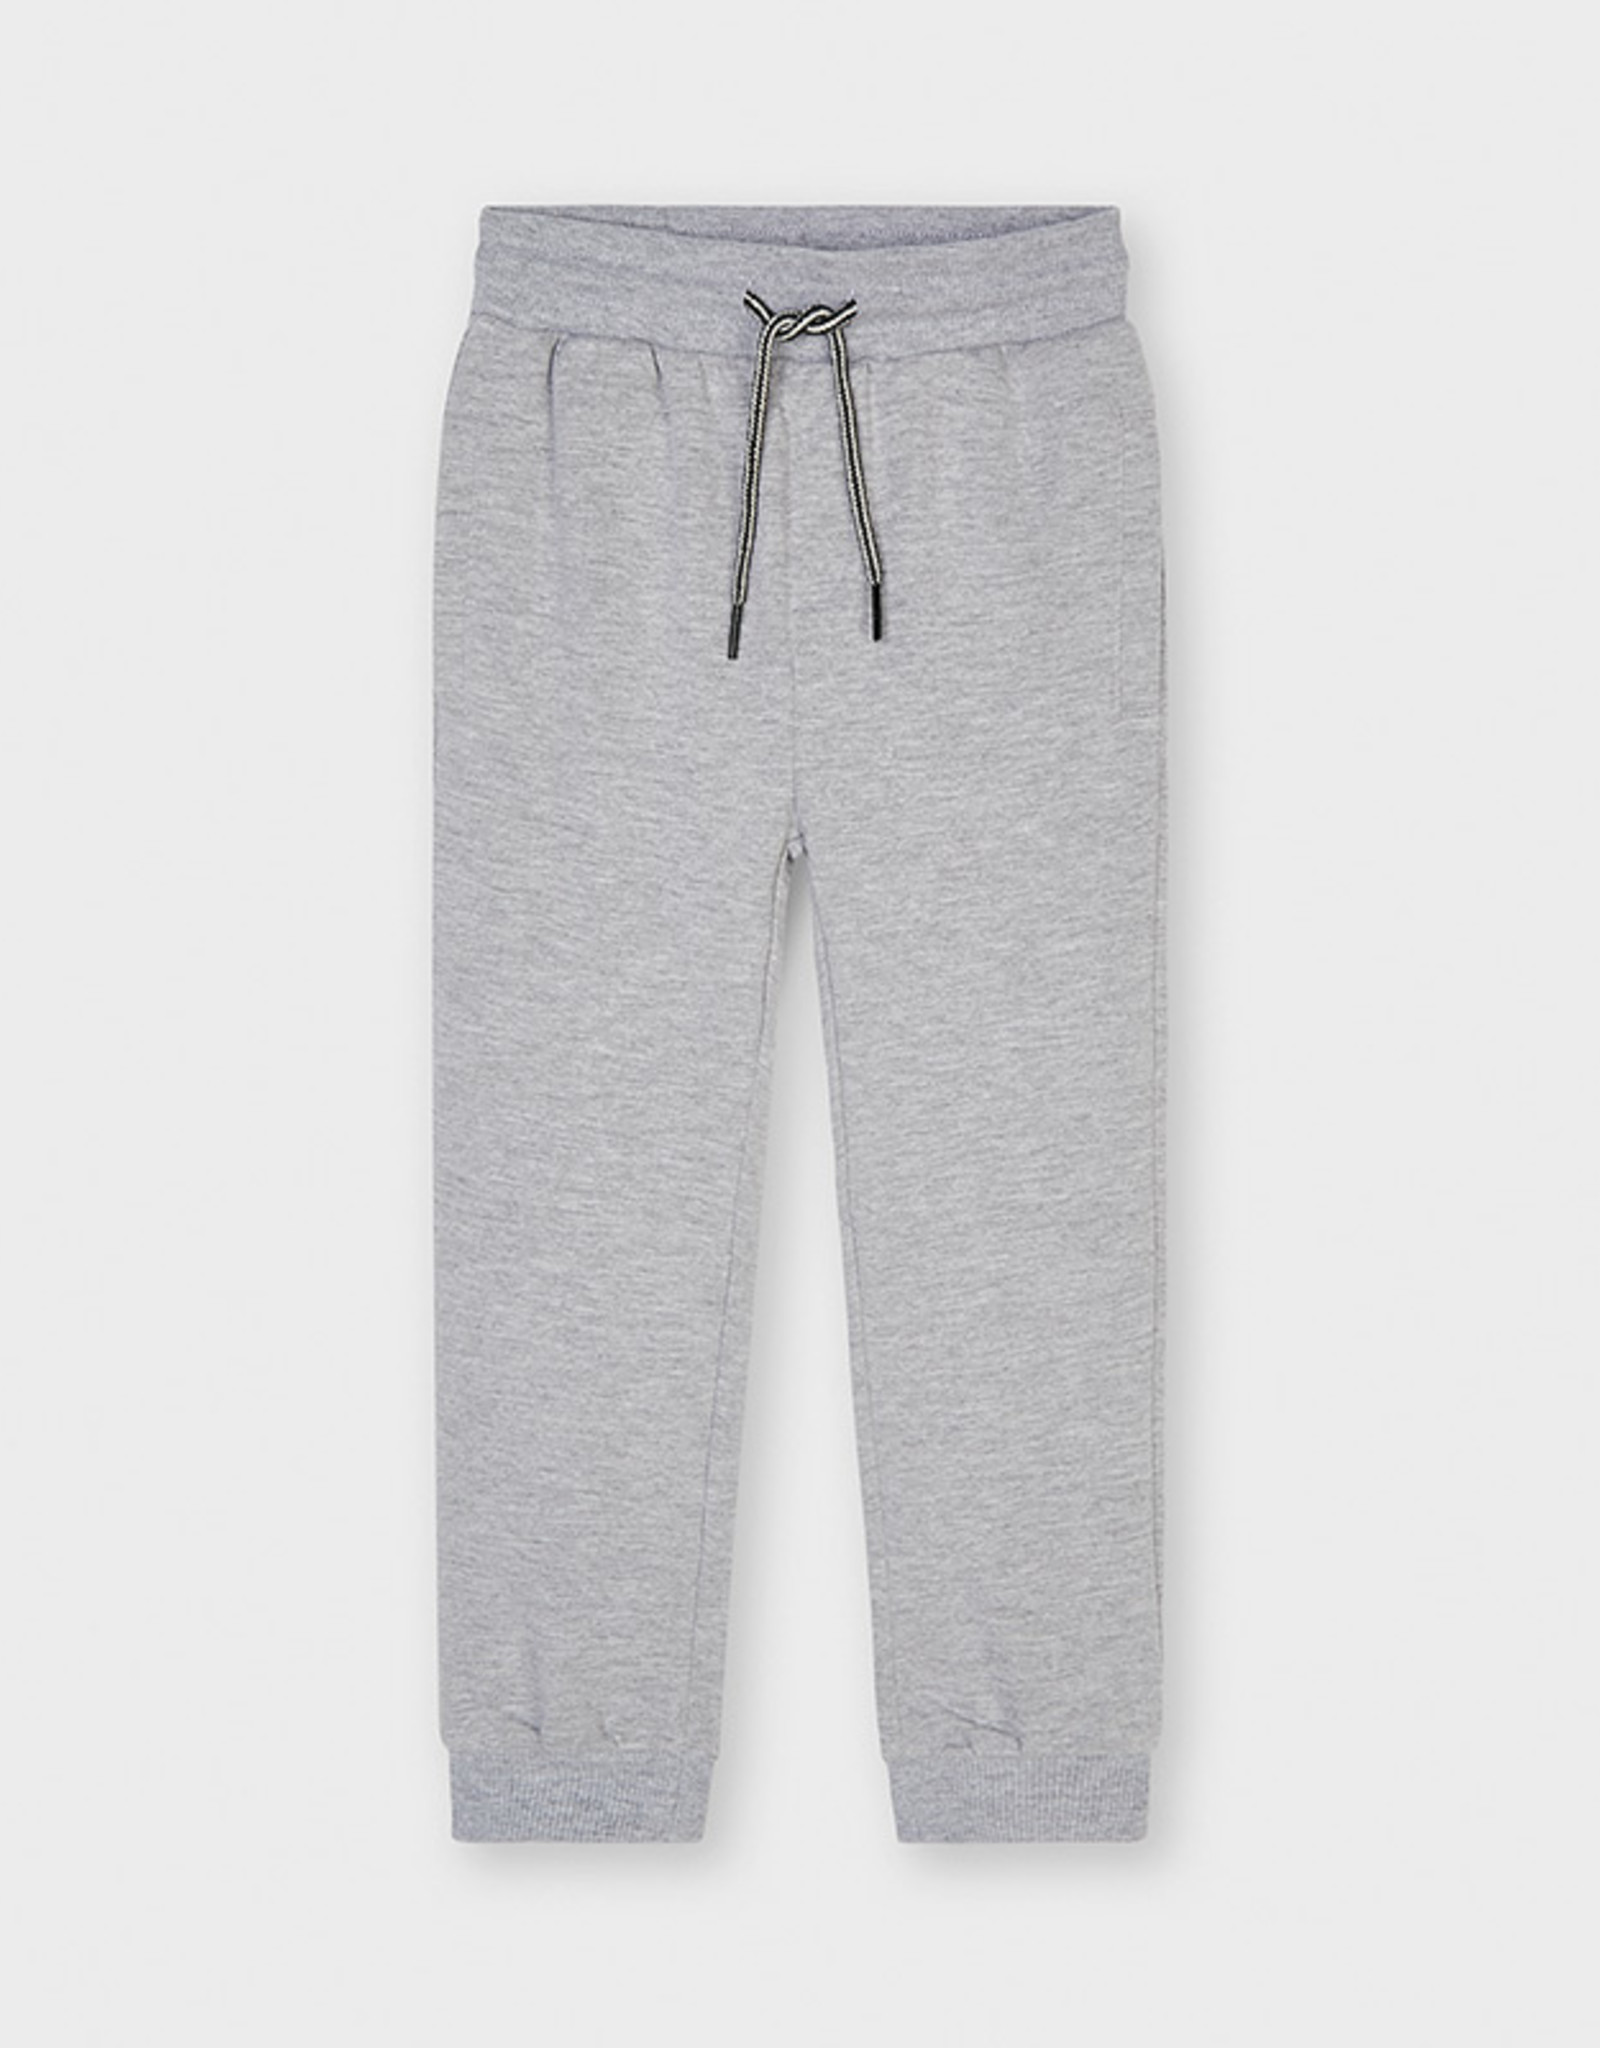 Mayoral Mayoral Boy Basic Cuffed Fleece Pants